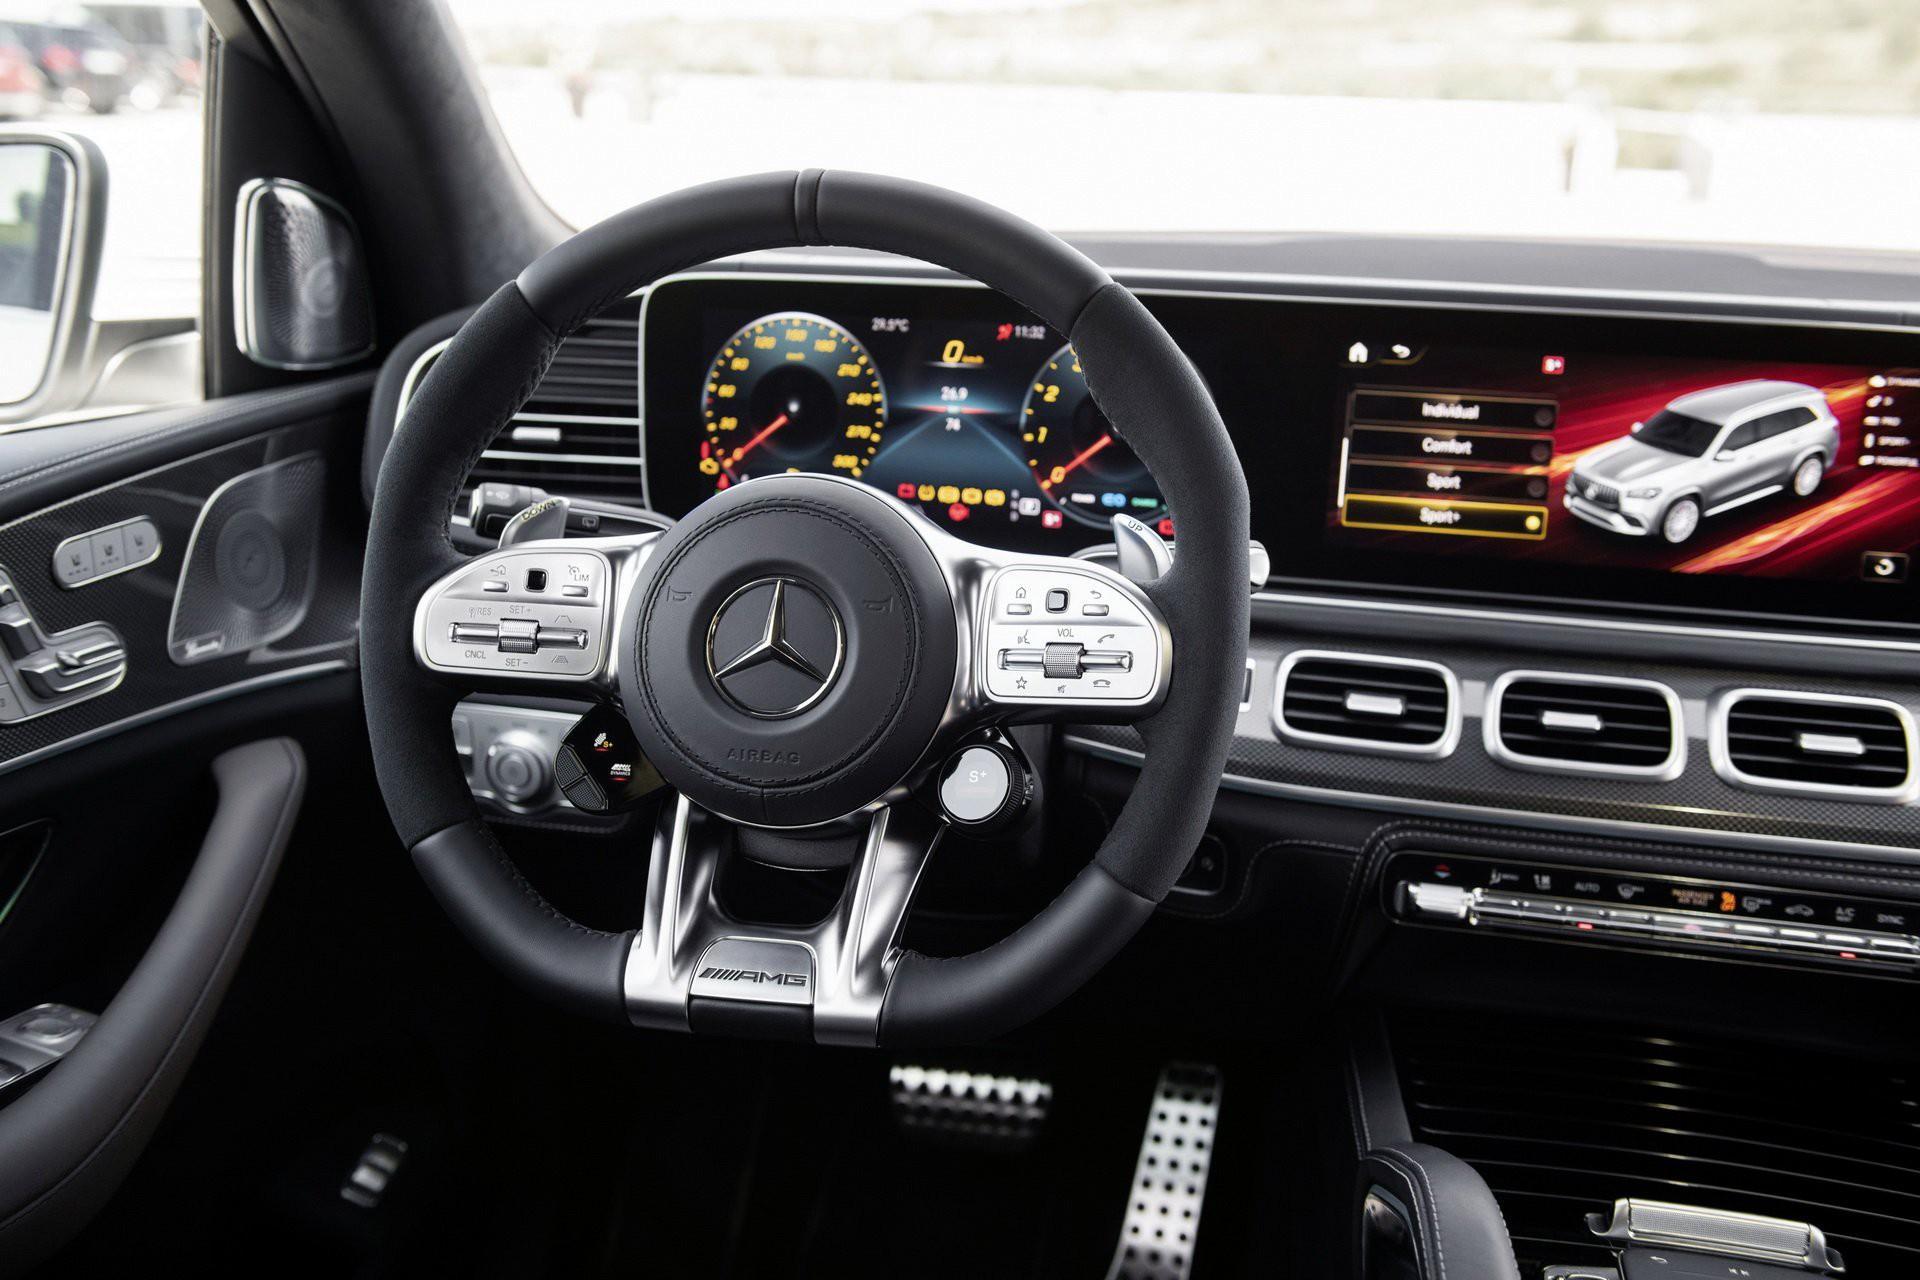 Khám phá Mercedes GLS 63 2020 vừa ra mắt Ảnh 13